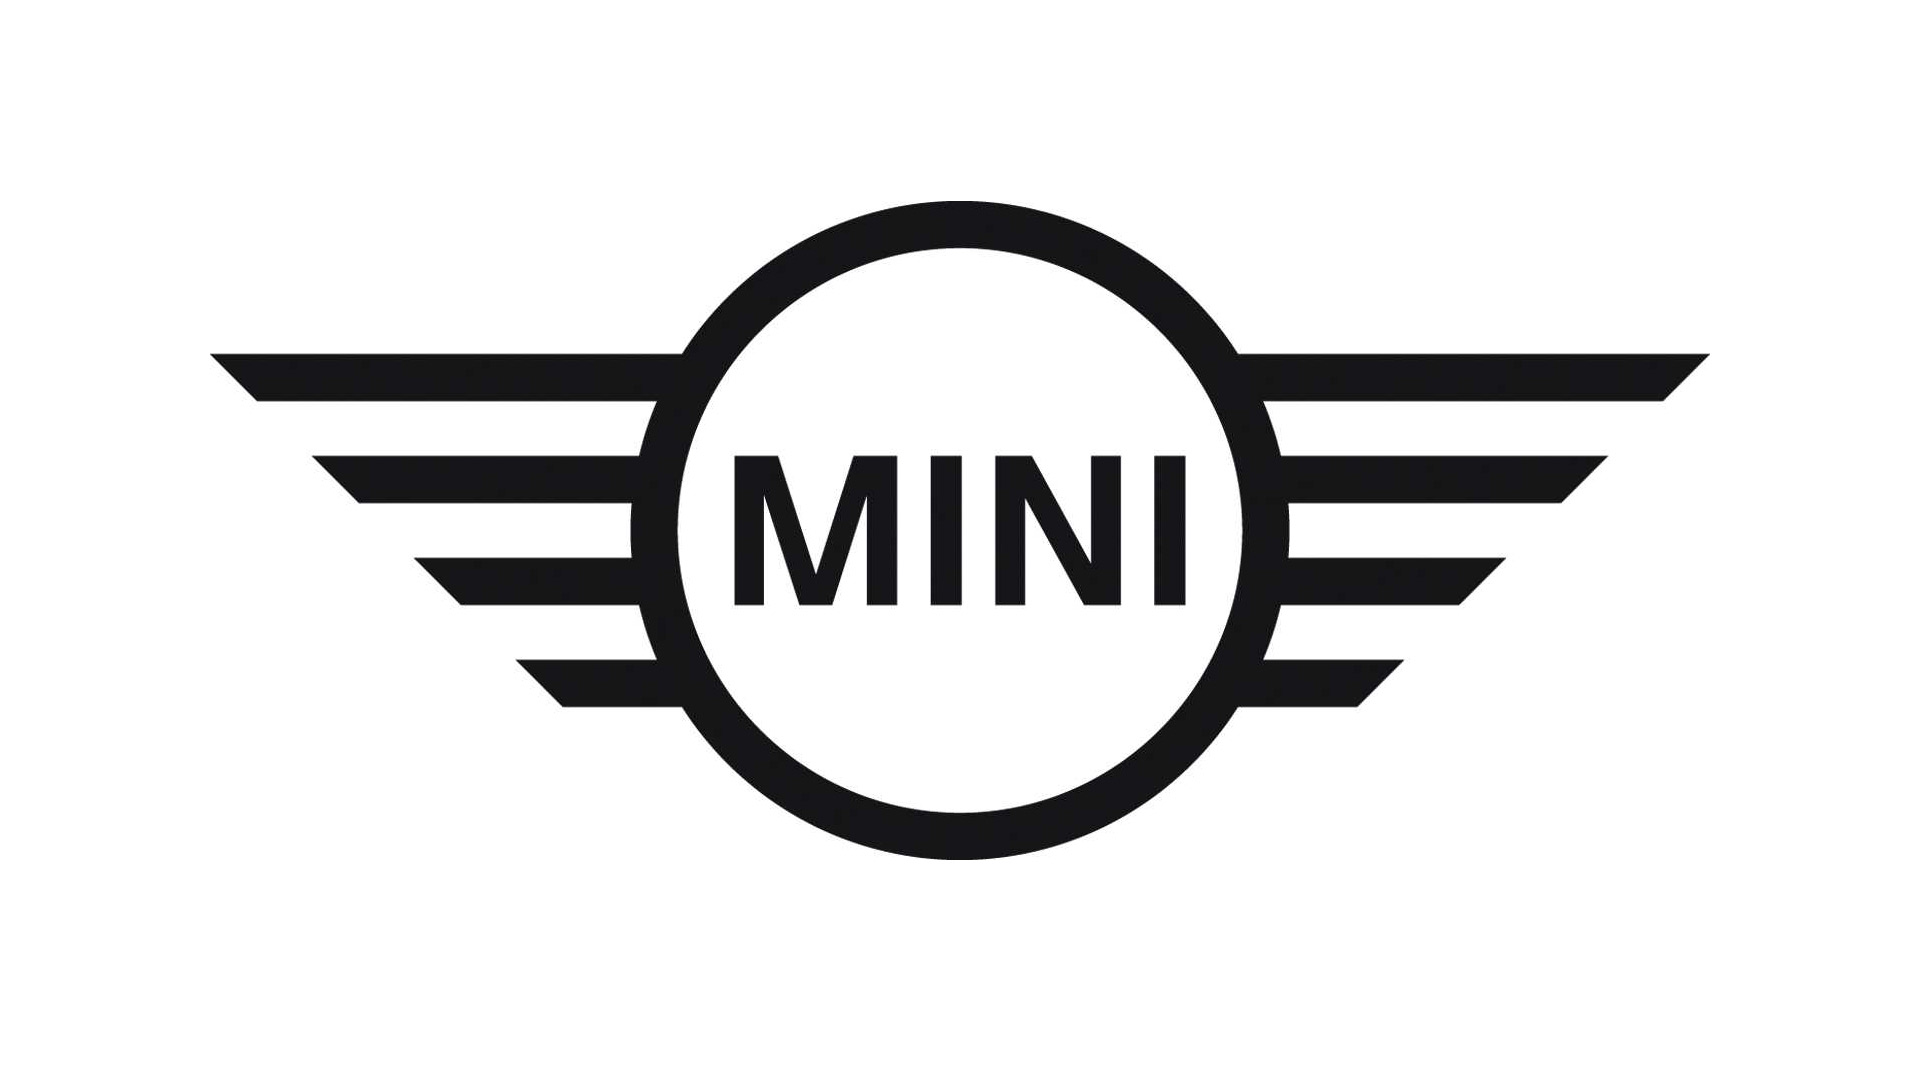 Mini Introduces New Logo